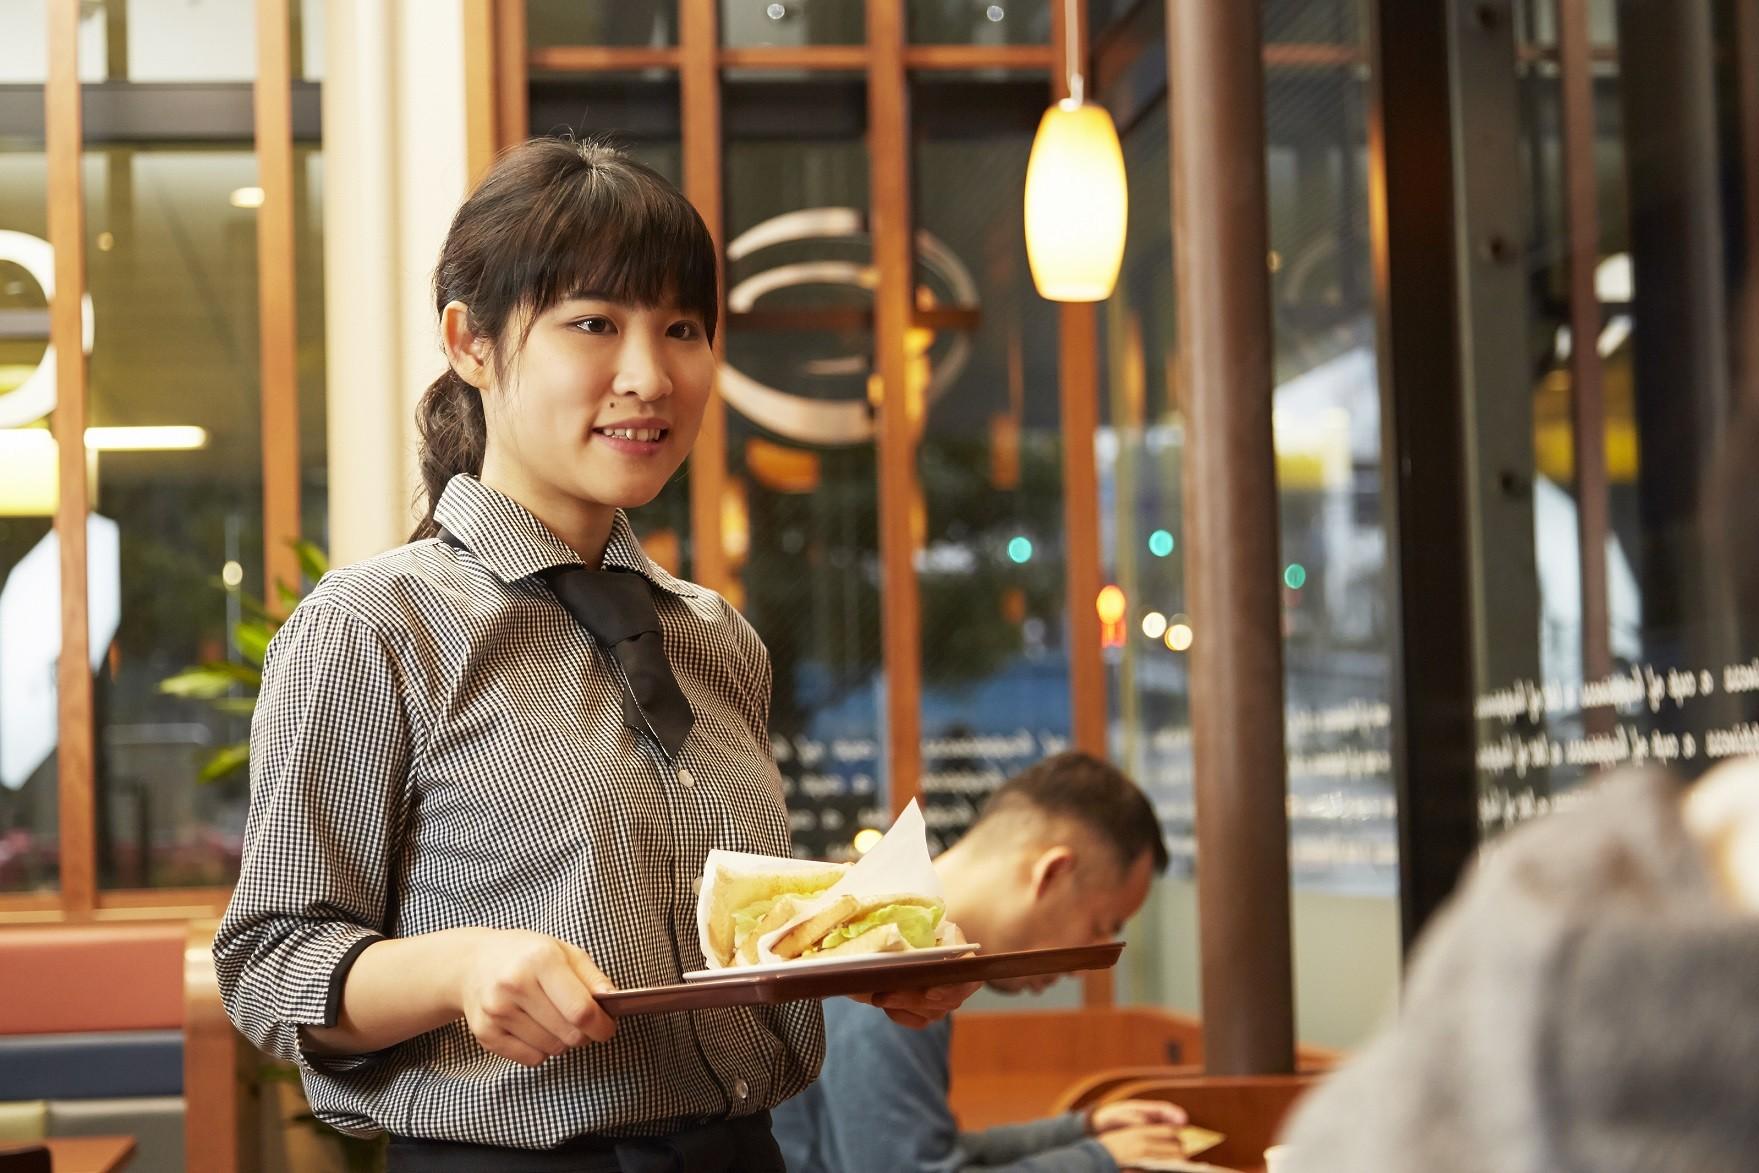 CAFE de CRIE(カフェ・ド・クリエ) オアシス21のアルバイト情報